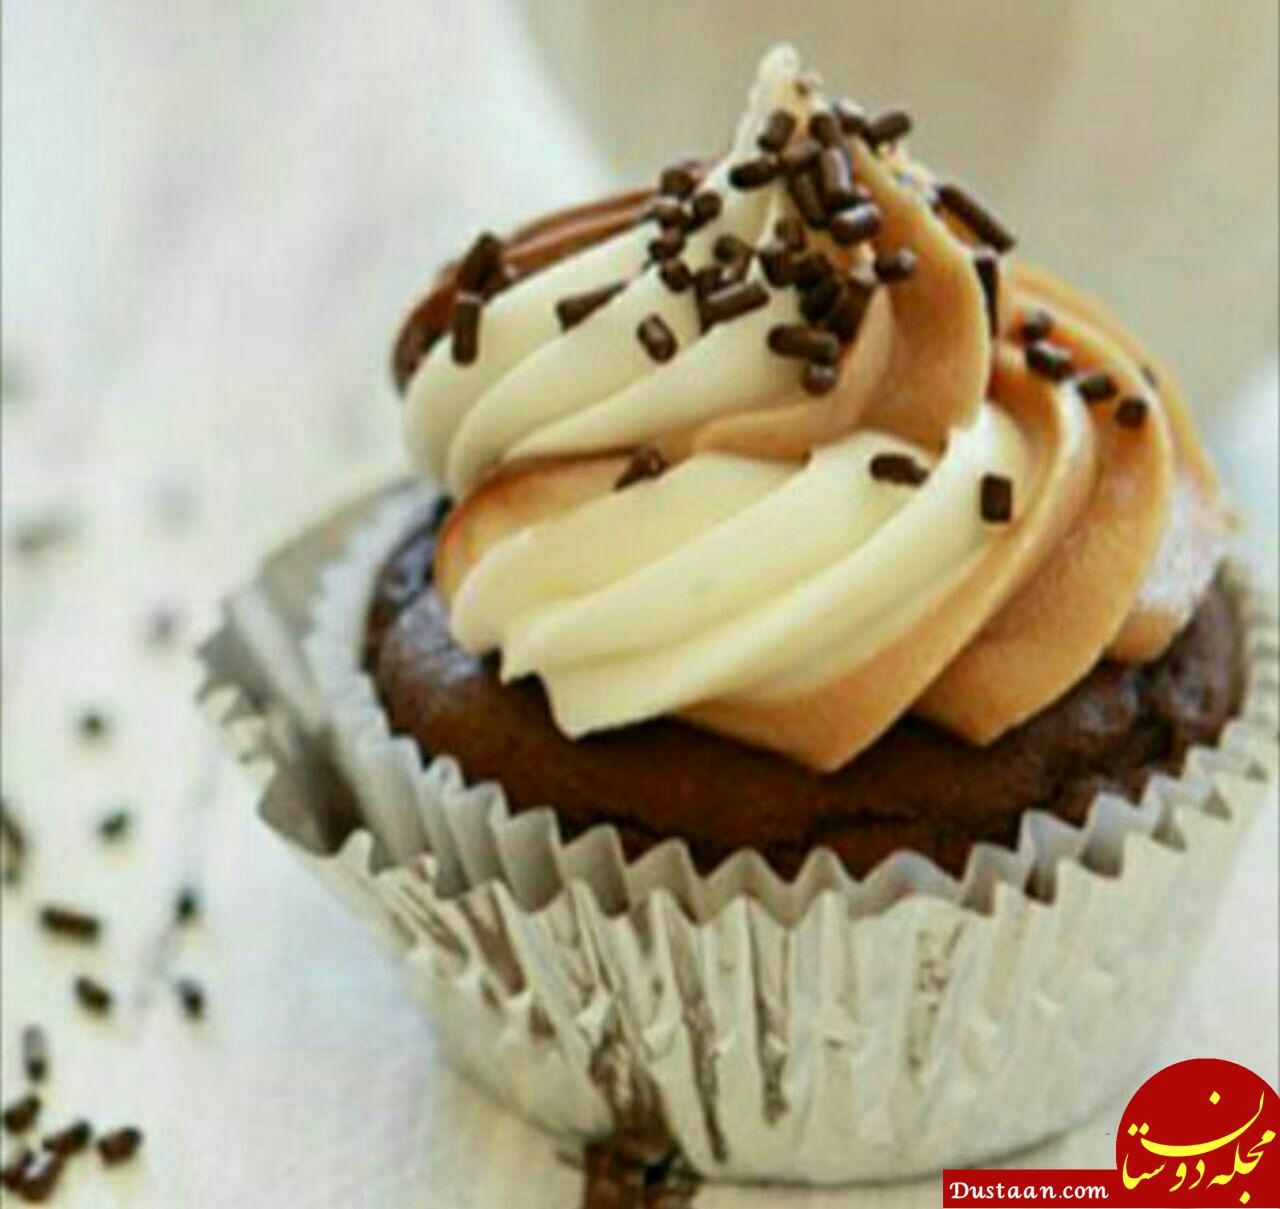 www.dustaan.com طرز تهیه کاپ کیک به سبکی خوشمزه و متفاوت